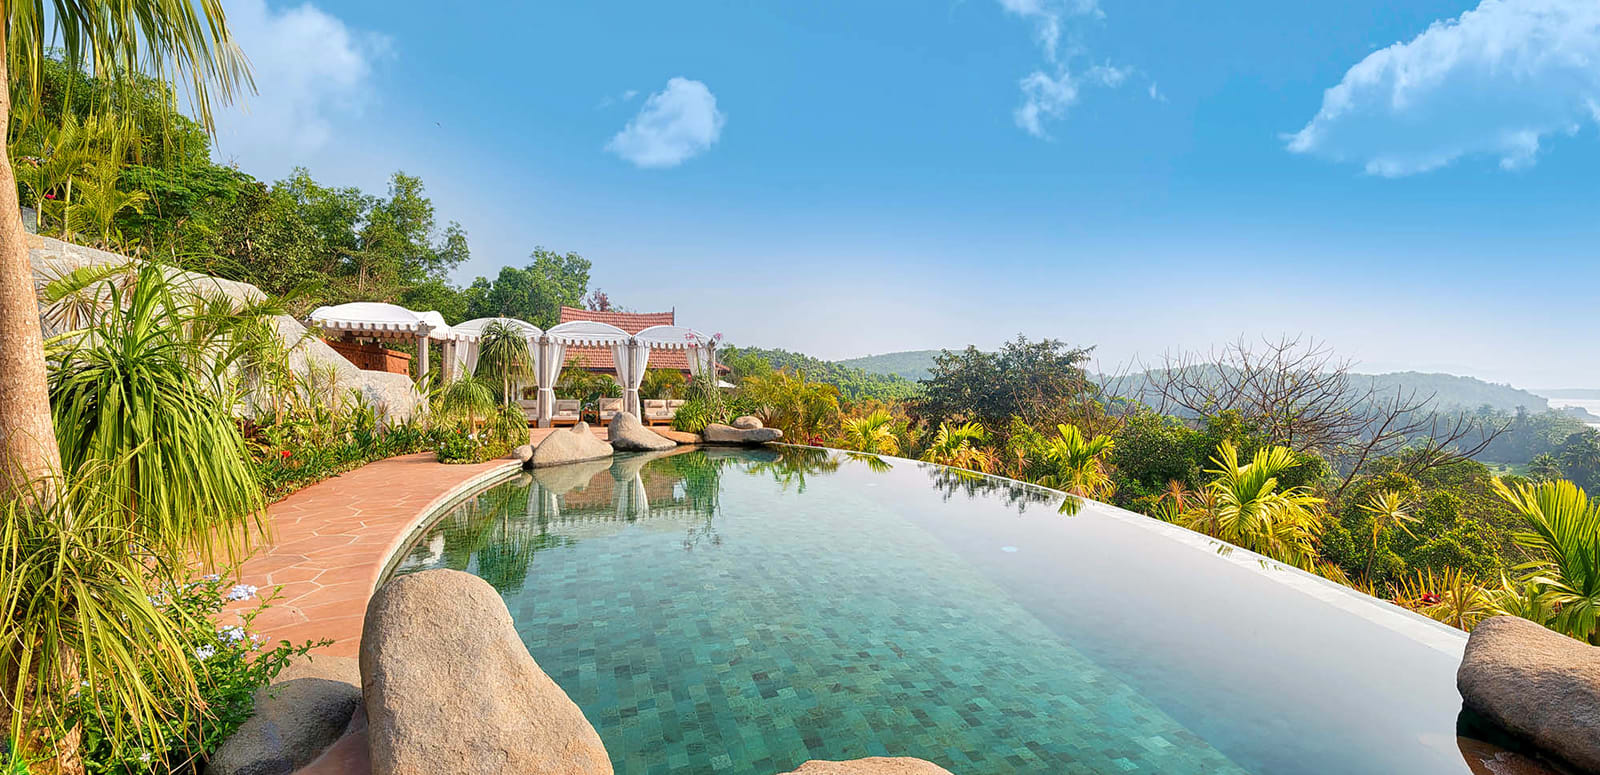 15 best resorts in gokarna - 2019 (2100+ reviews & photos)